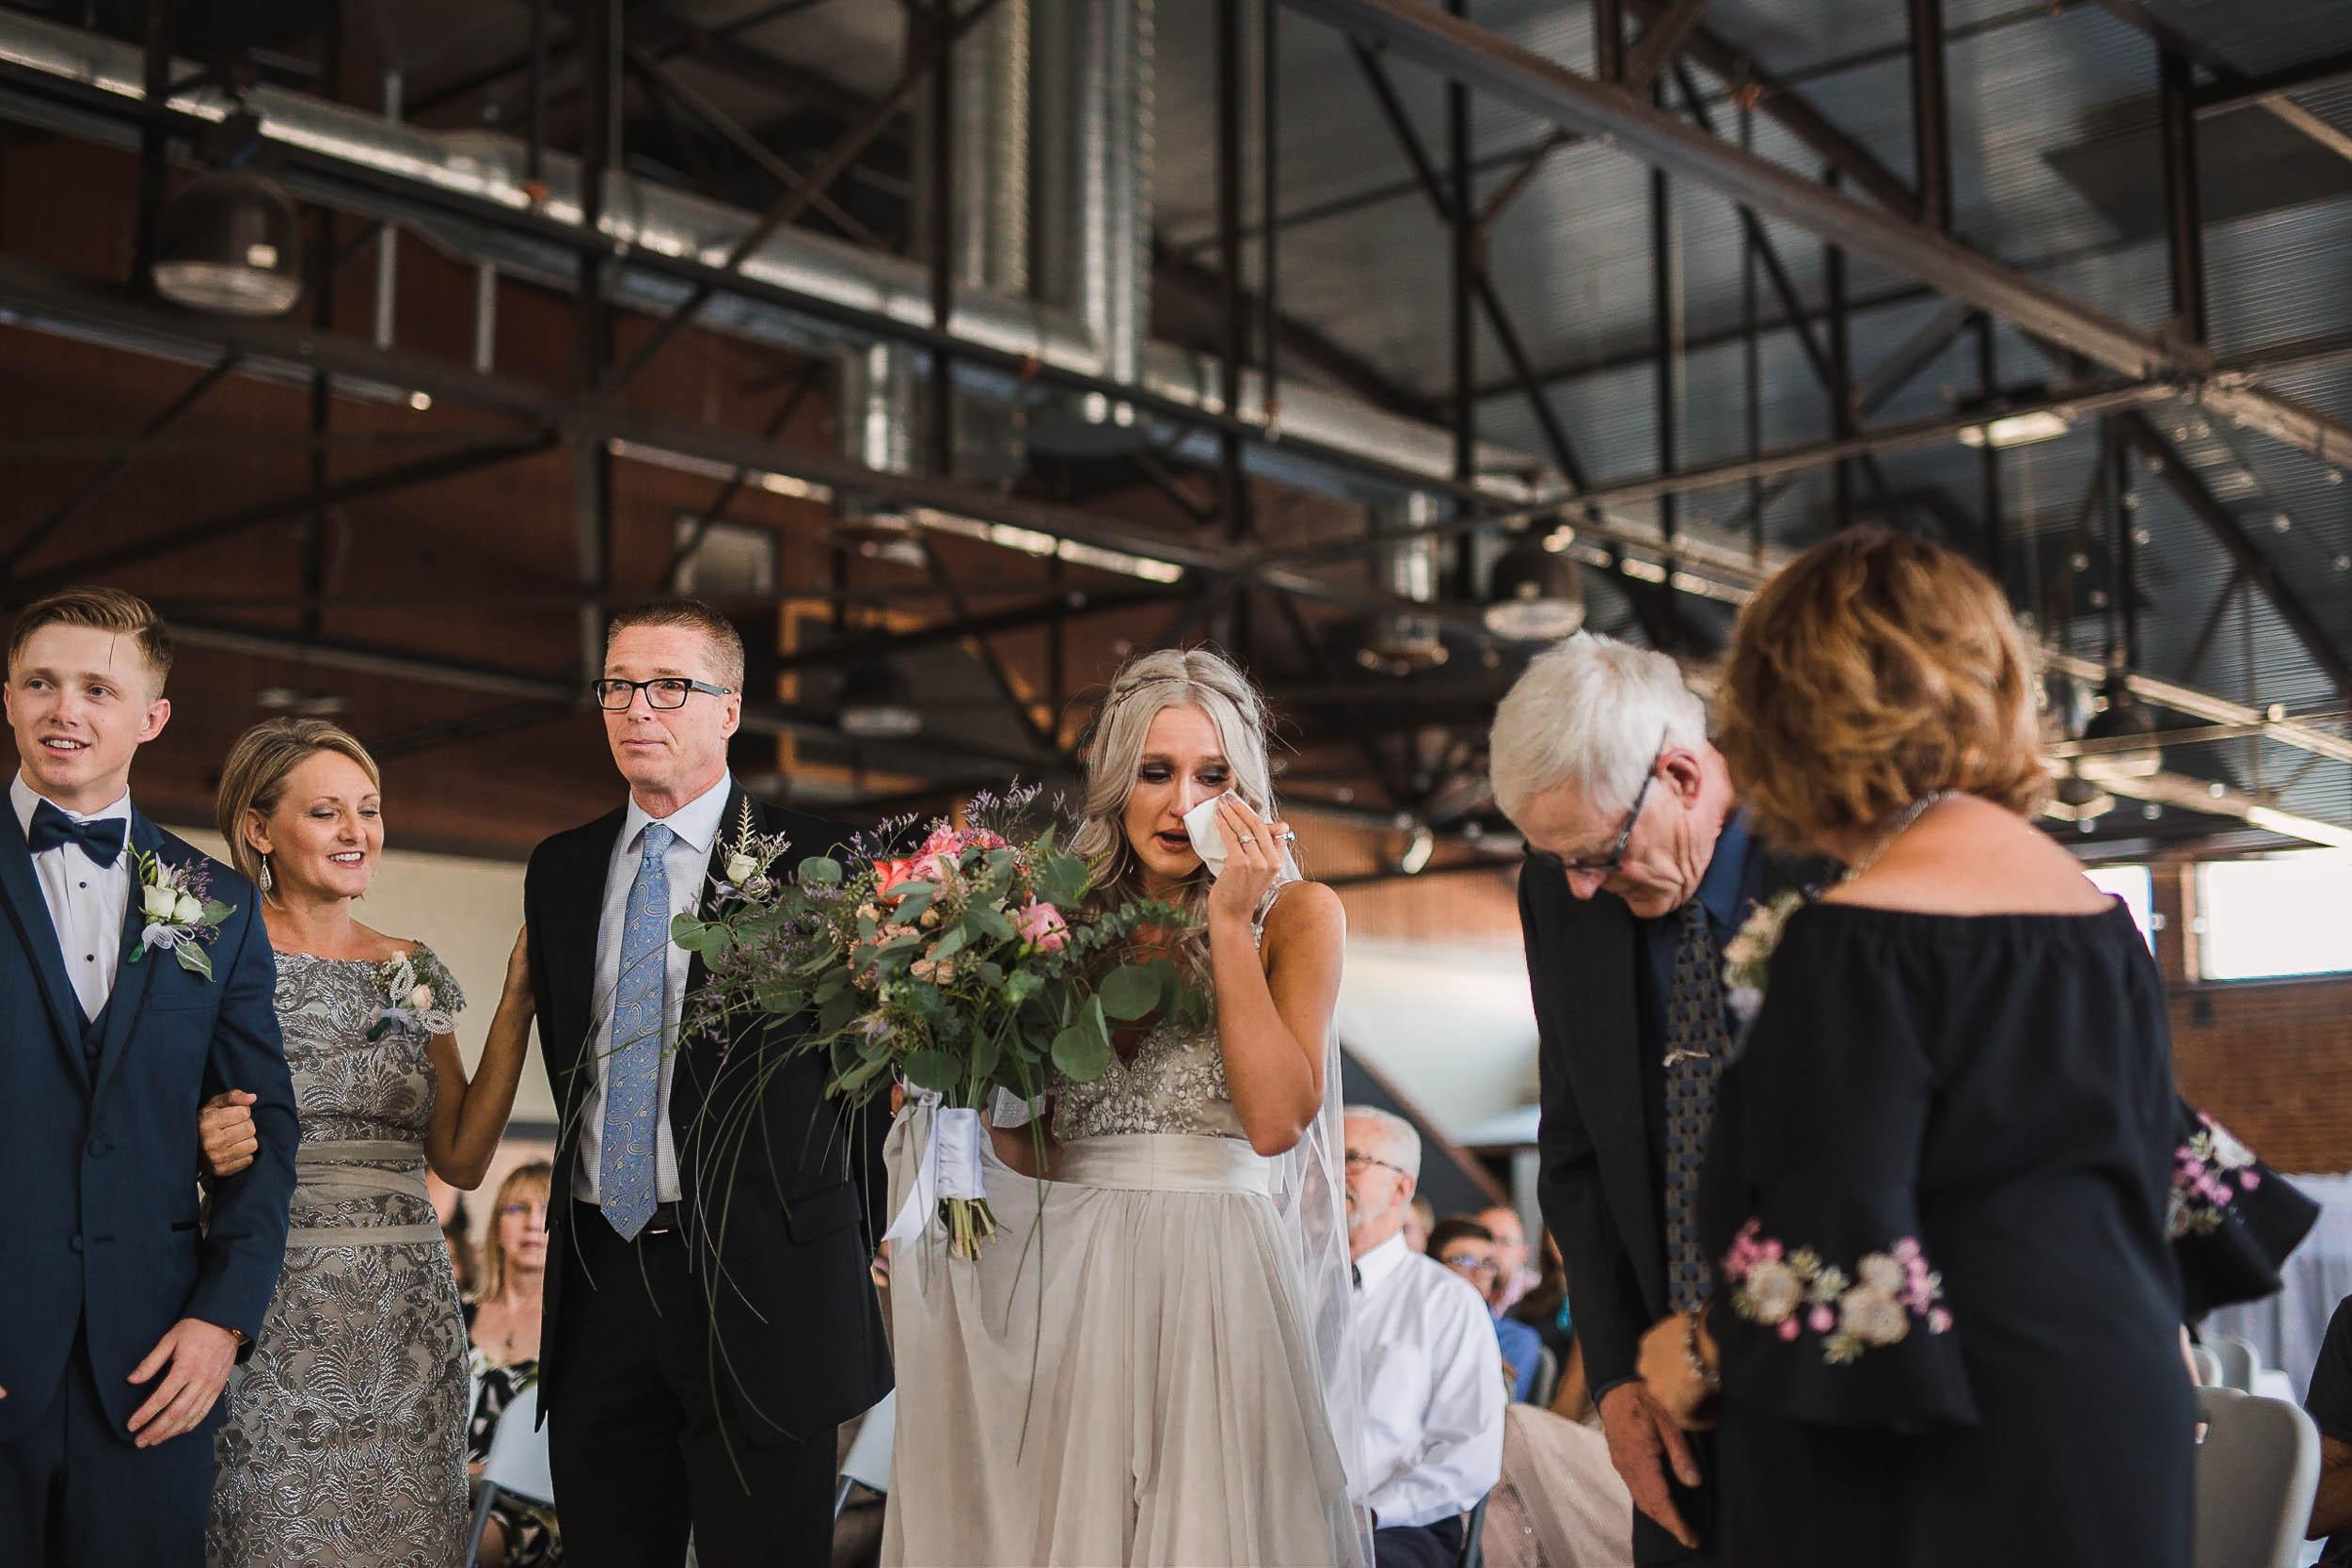 Emotional bride at wedding ceremony